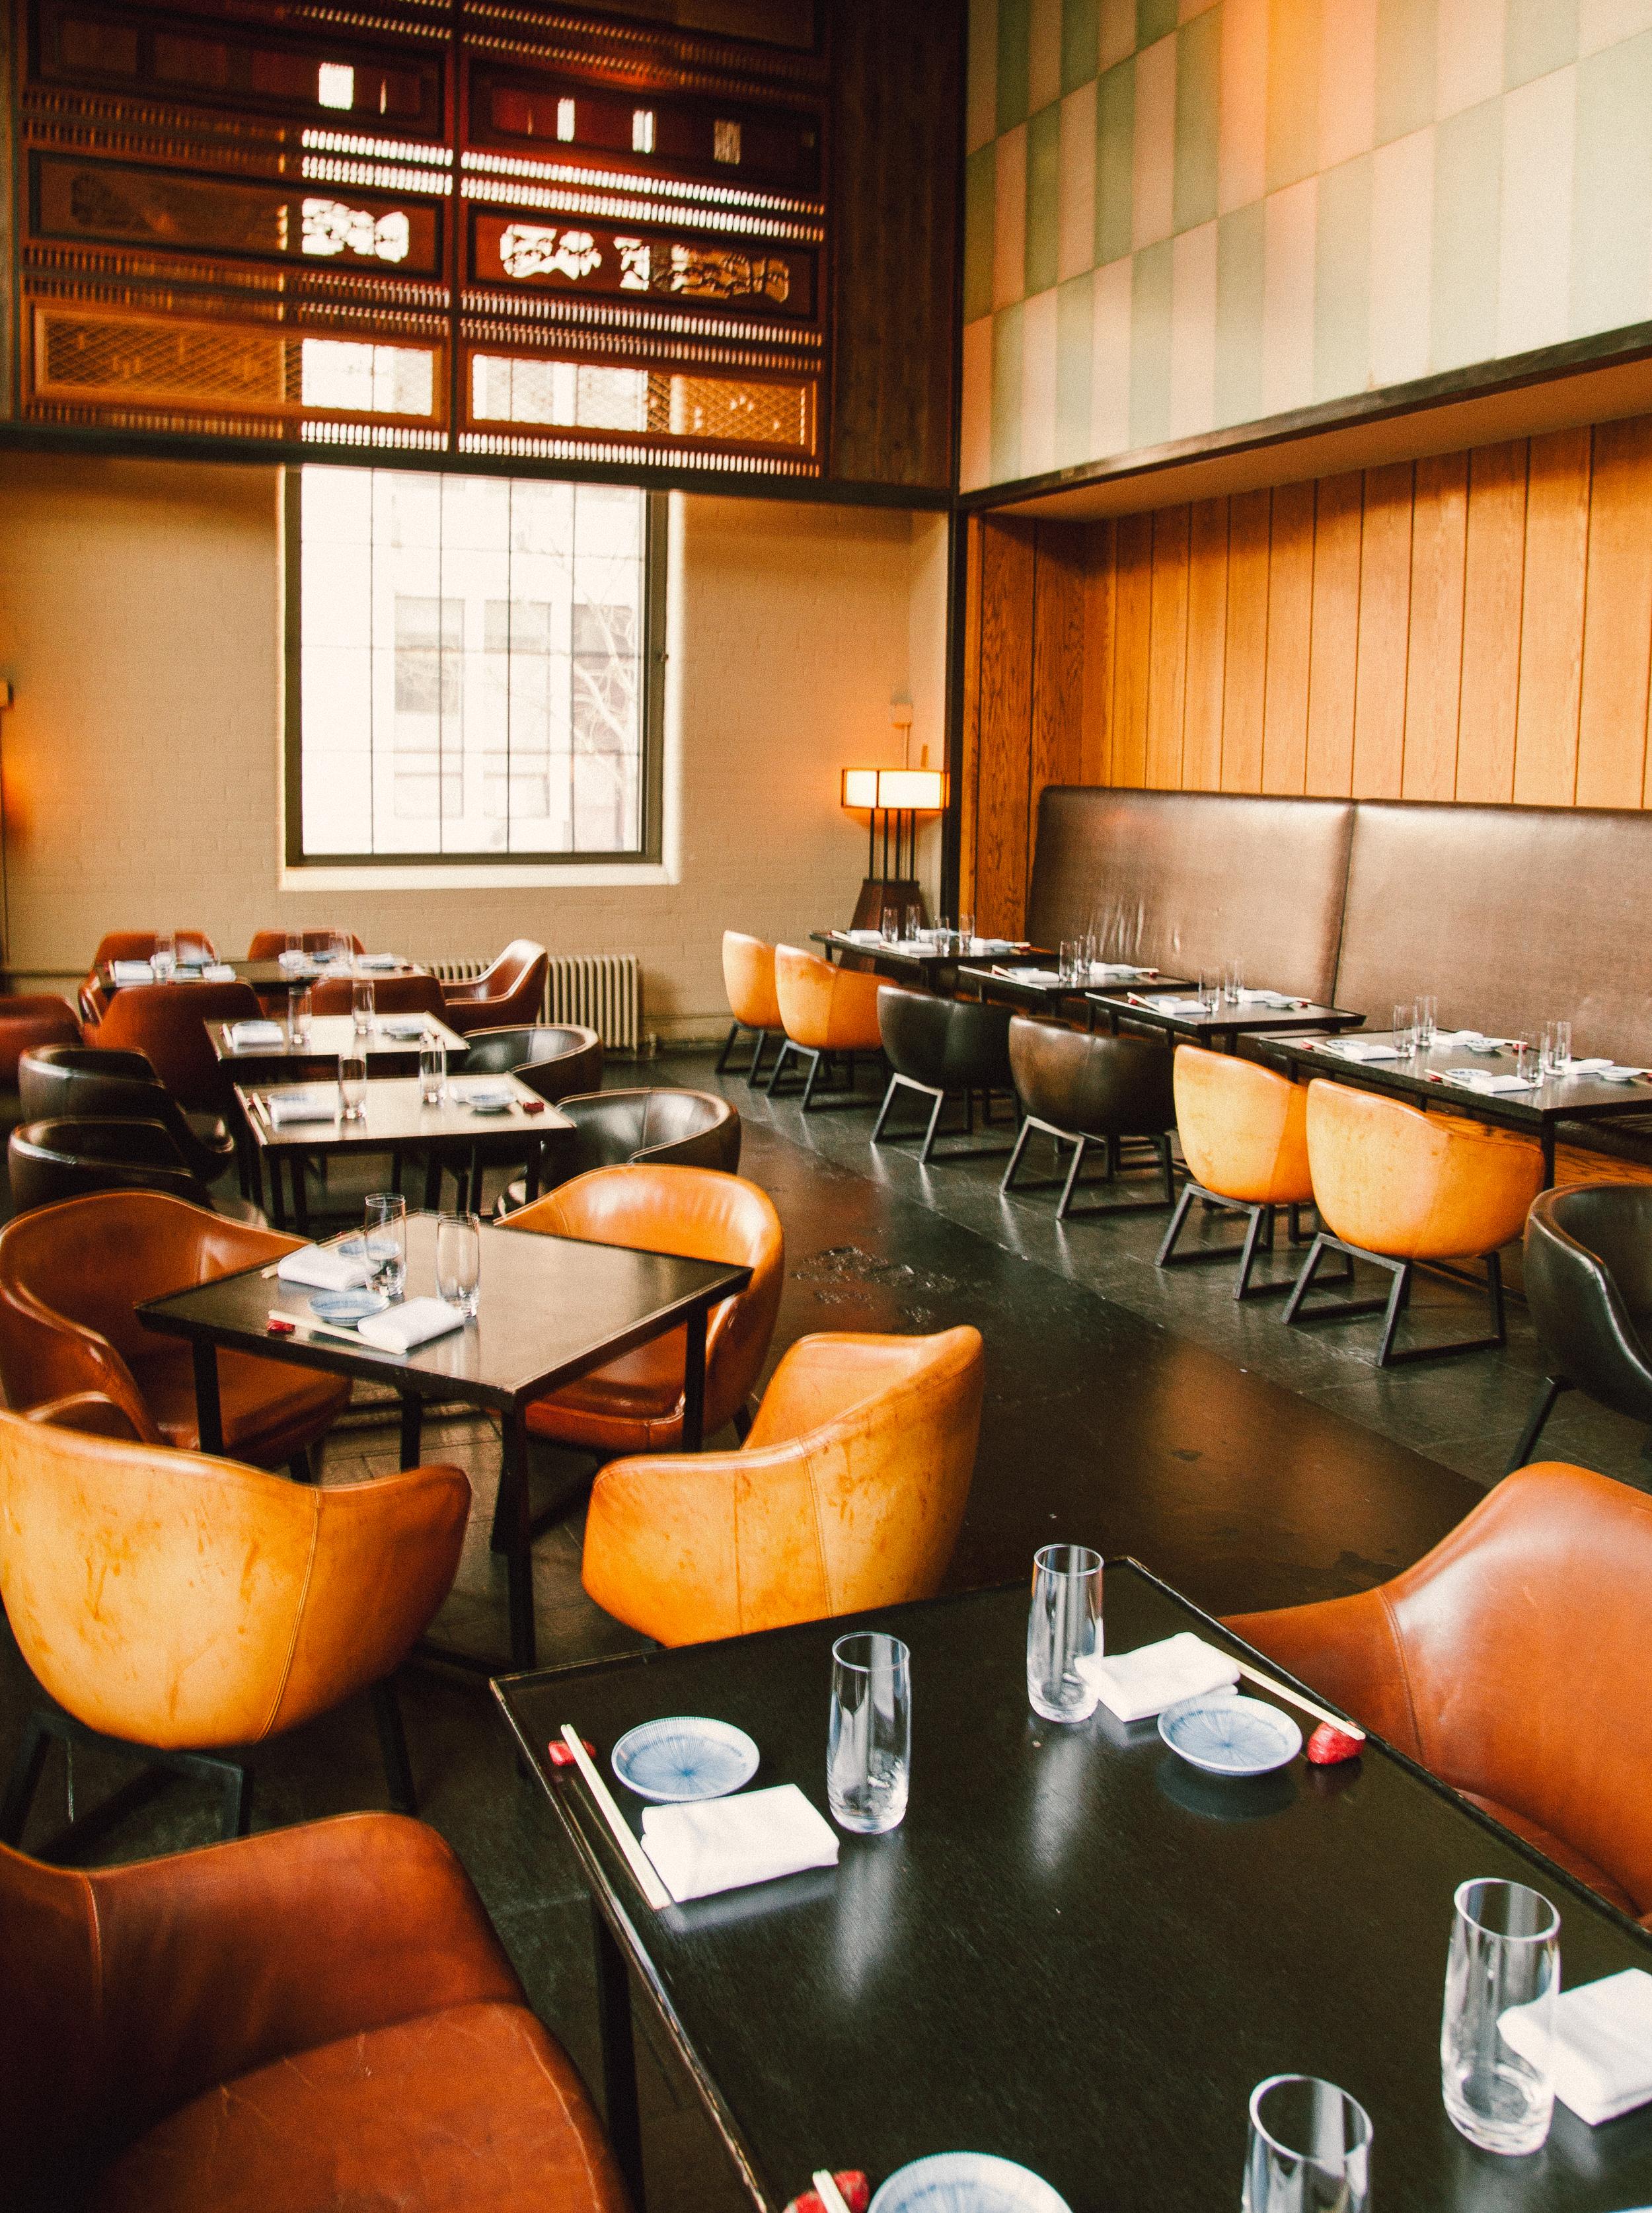 editorial-commercial-photography-long-island-ny-nyc-restaurant-photography-digital-2.jpg